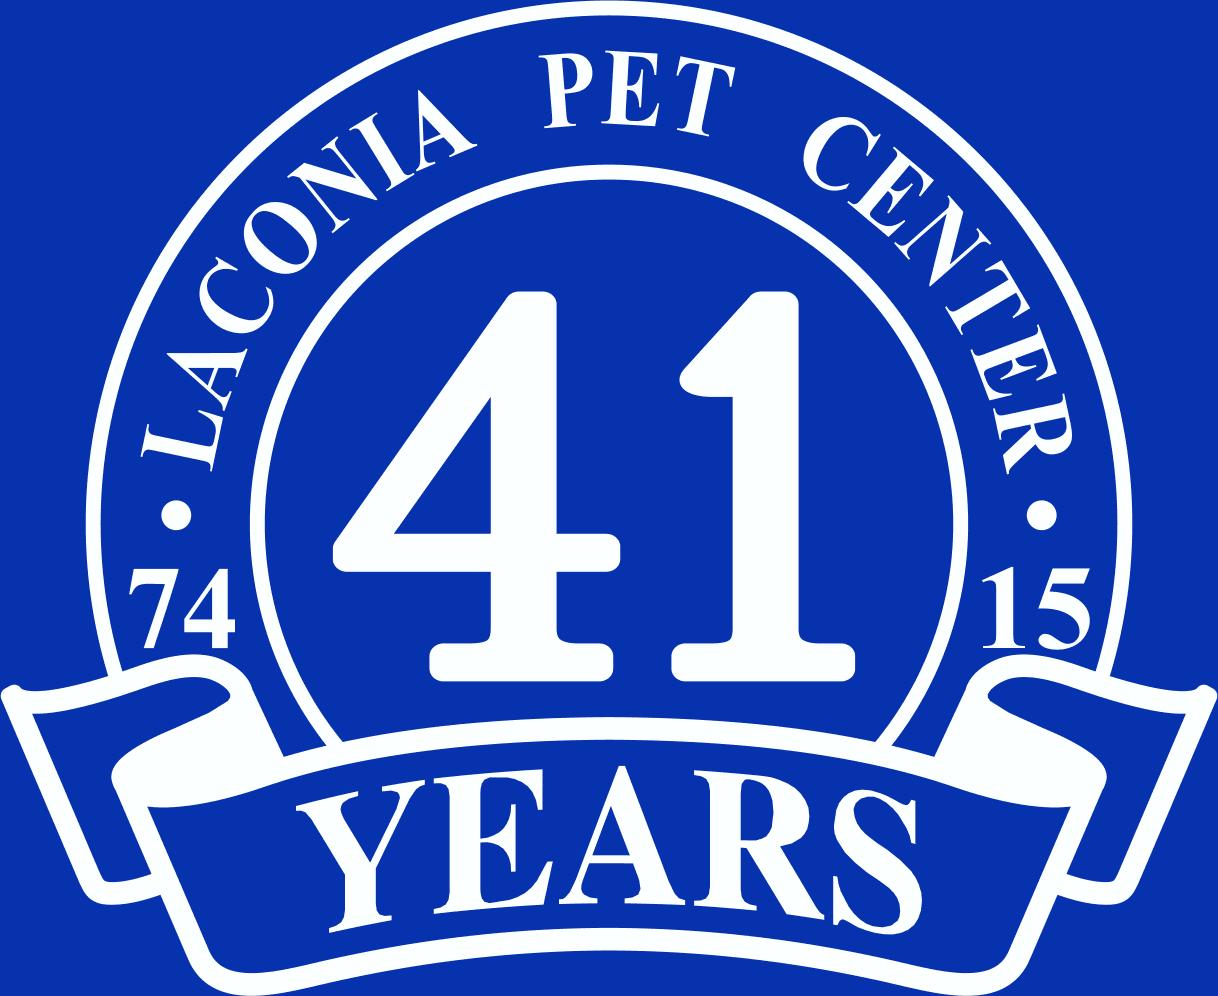 Pet Store Rochester, NH